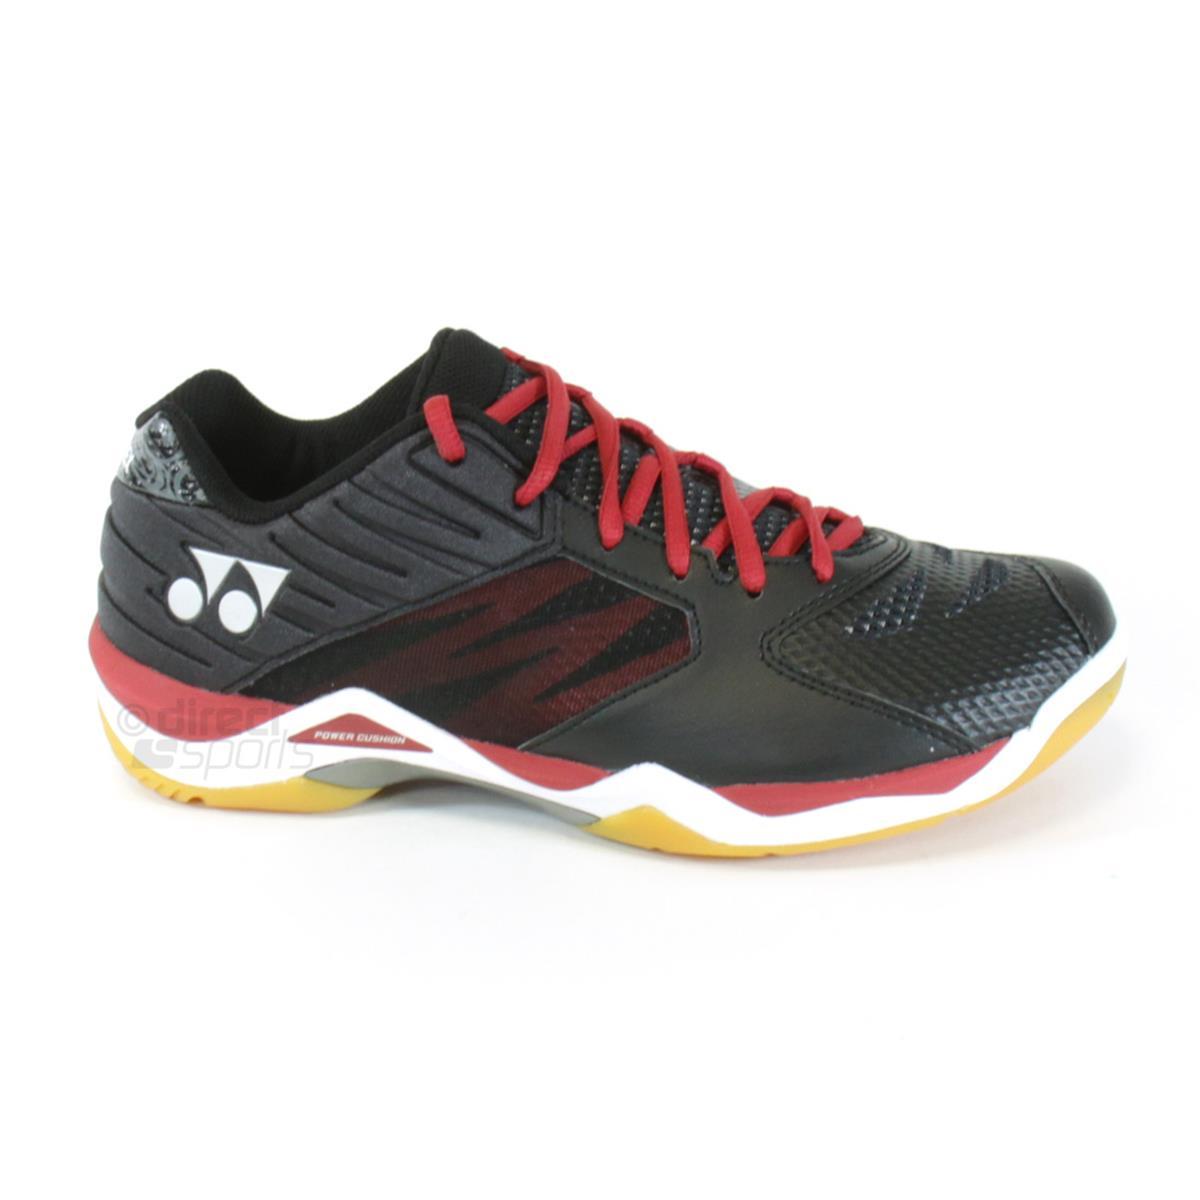 f0f73e3b484 Yonex Power Cushion Comfort ZM Badminton Shoes (Black ...